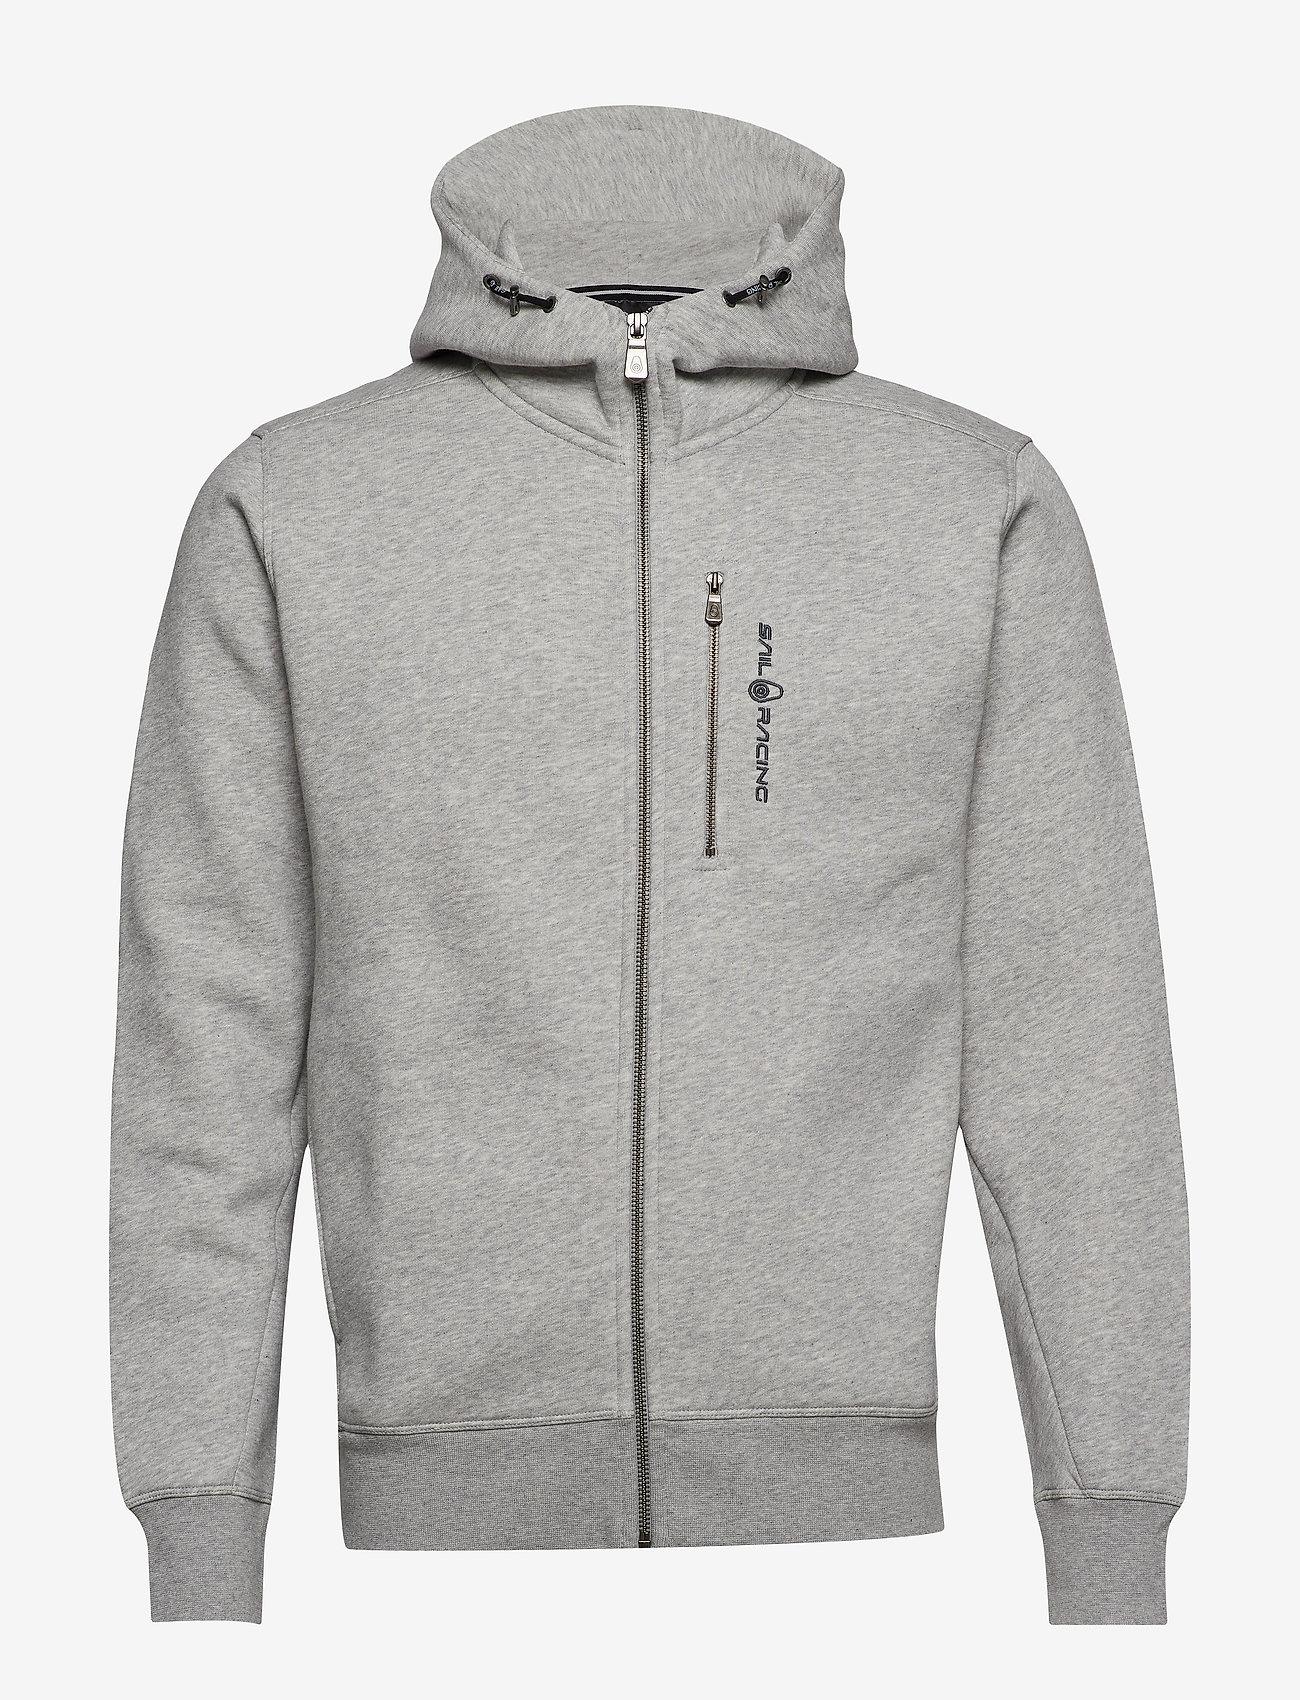 Sail Racing - BOWMAN ZIP HOOD - hoodies - grey mel - 0